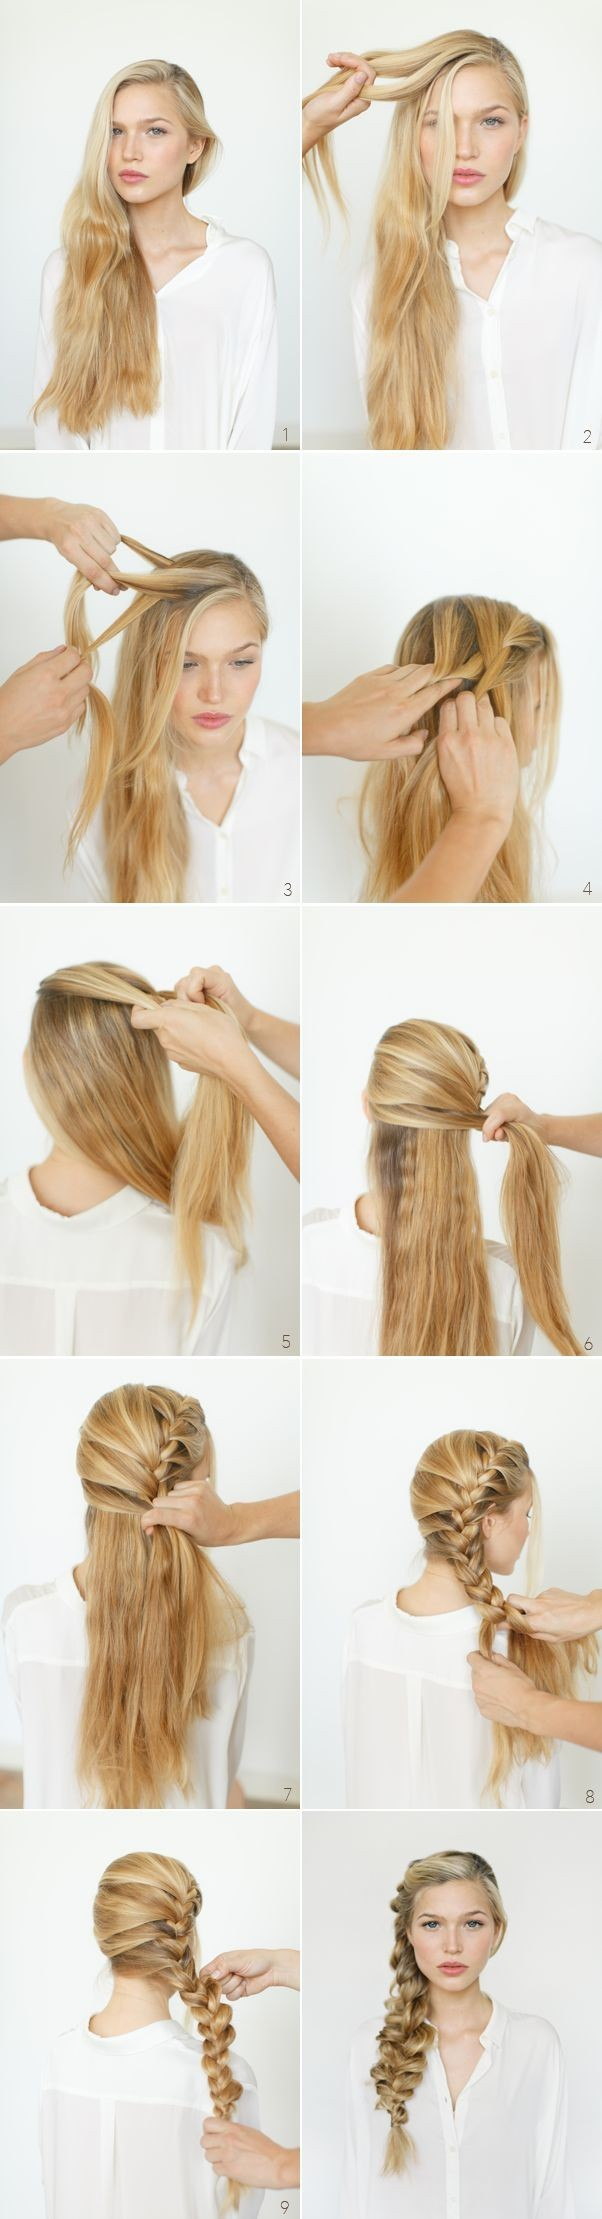 Romantic-Side-Braid-Hairstyle-Tutorial